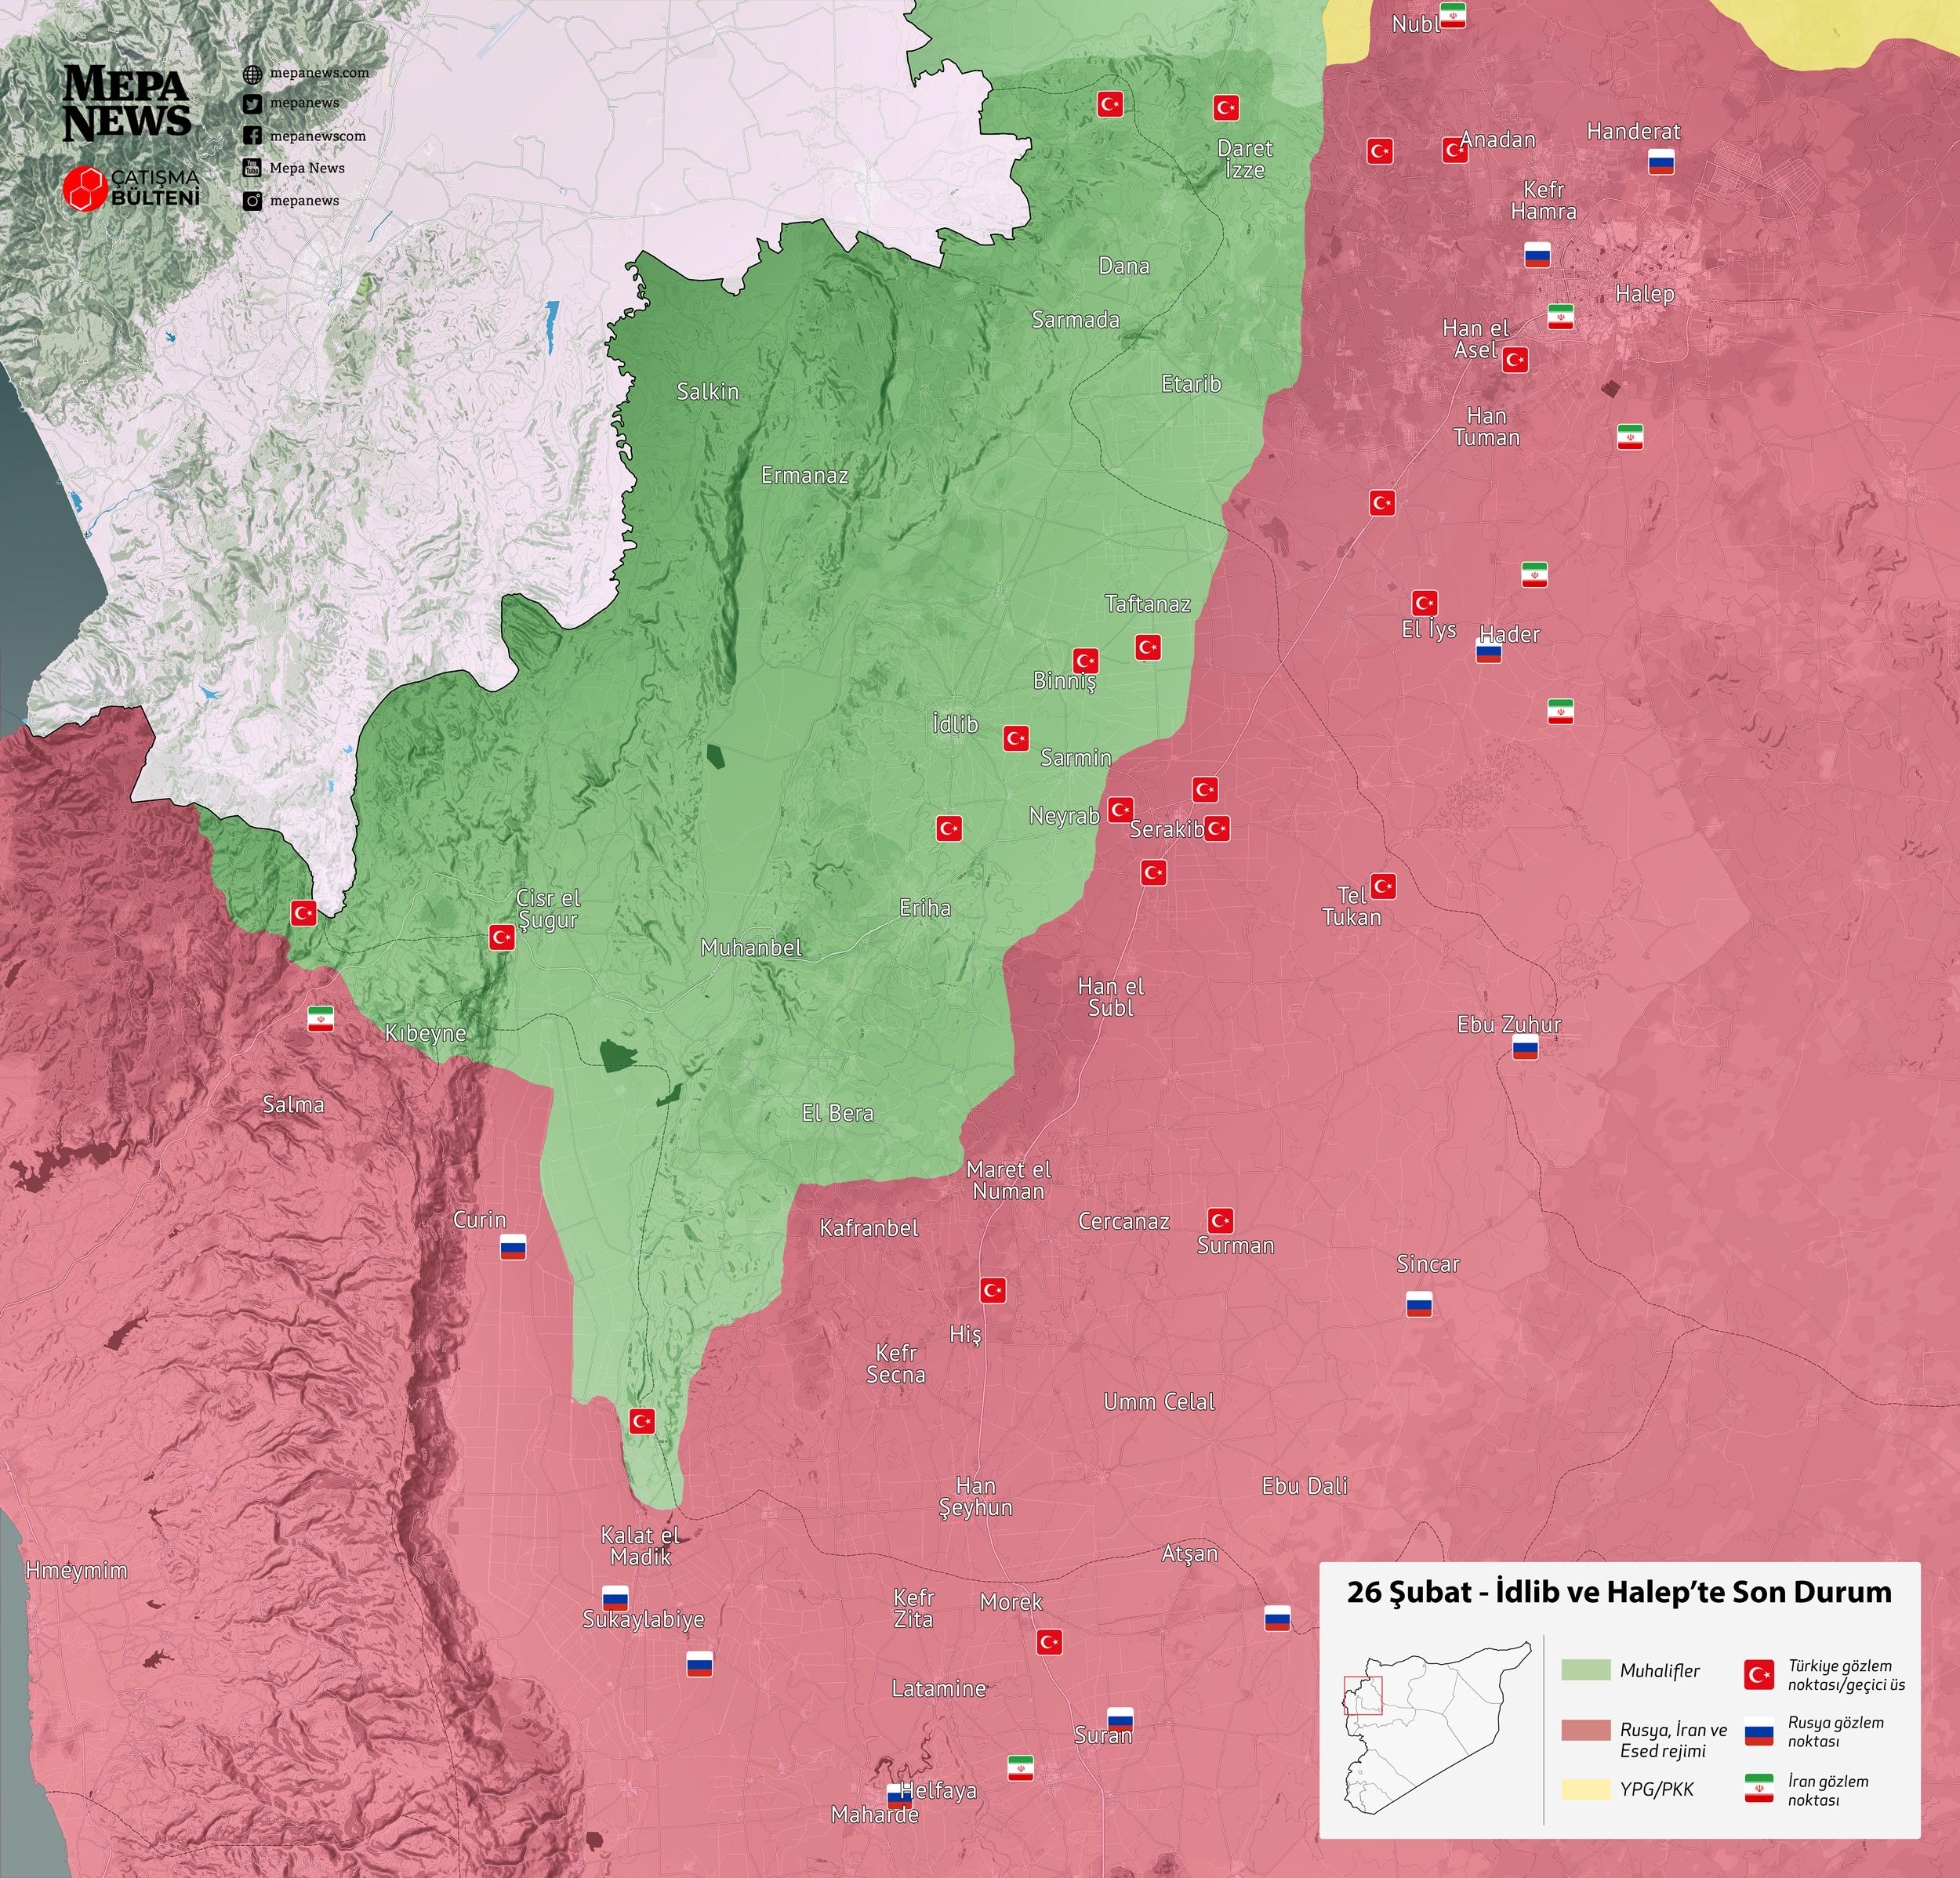 İdlib'de son durum (26 Şubat 2020)